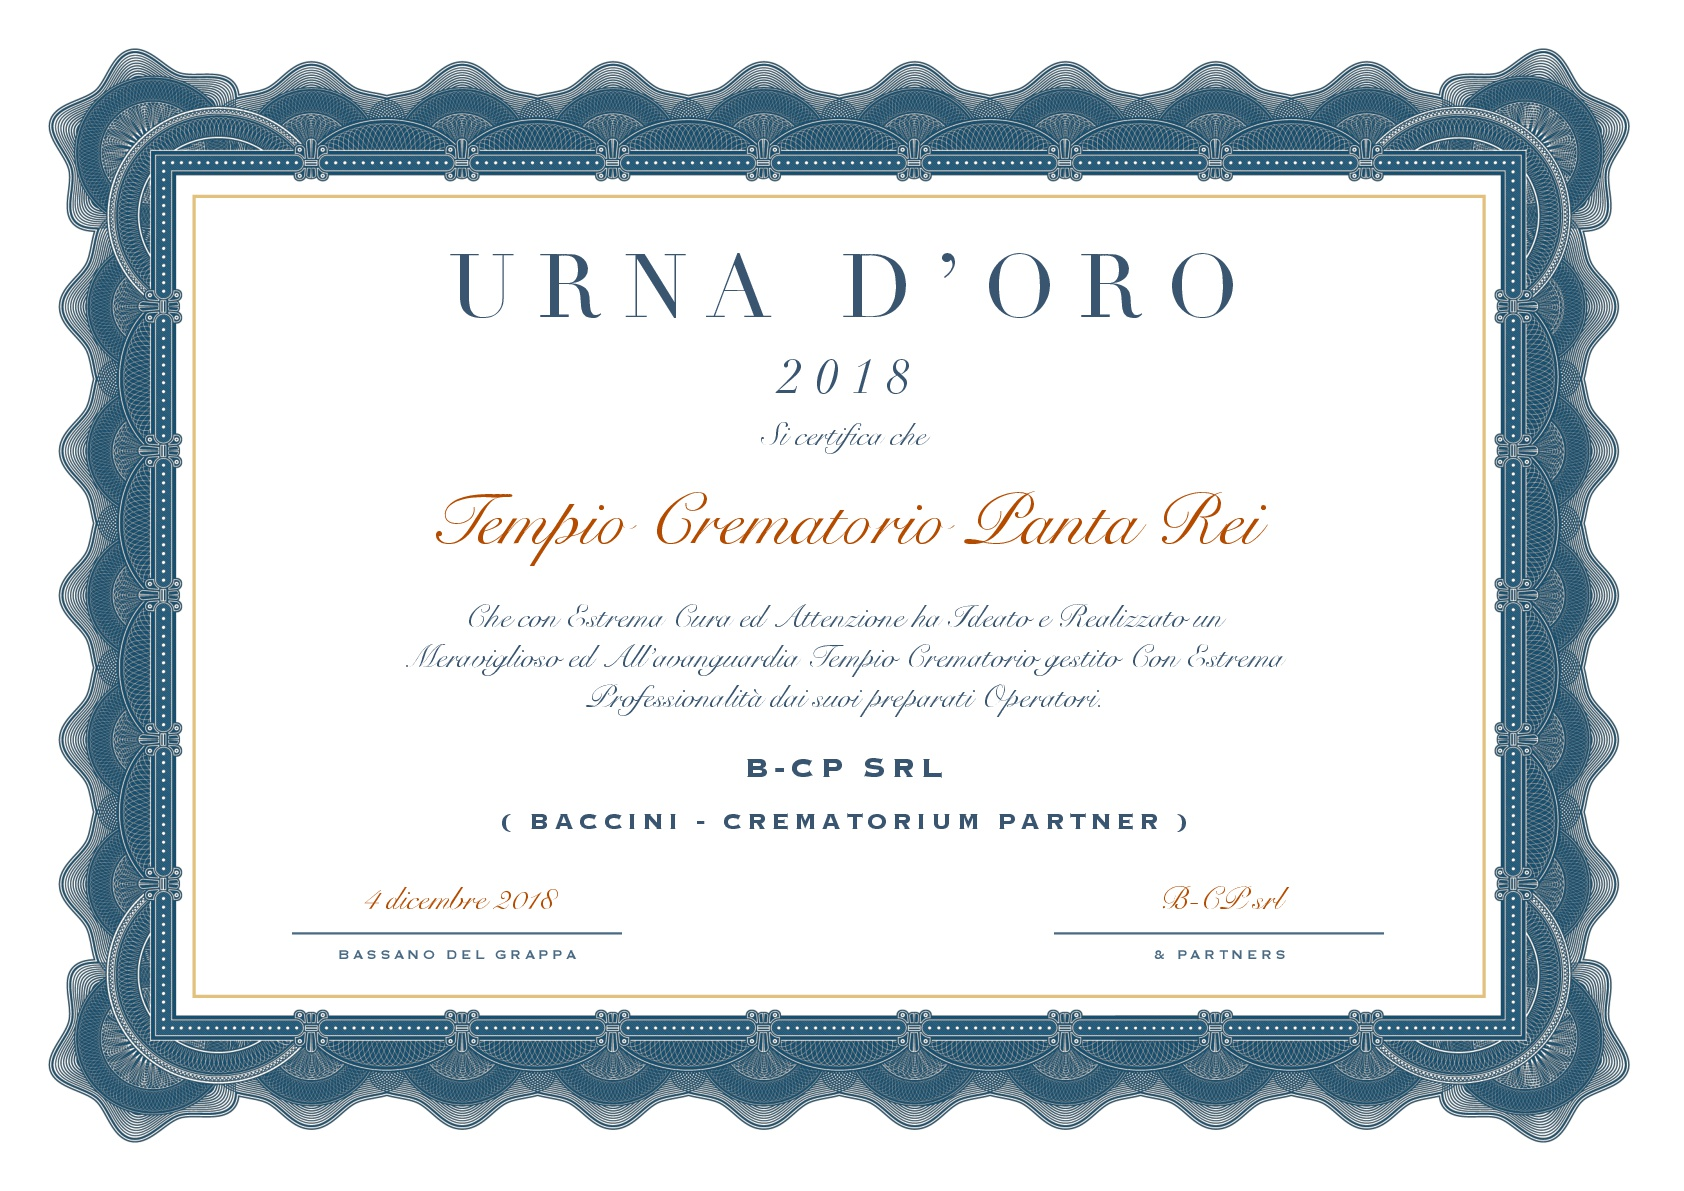 URNA D'ORO 2018-001.jpg